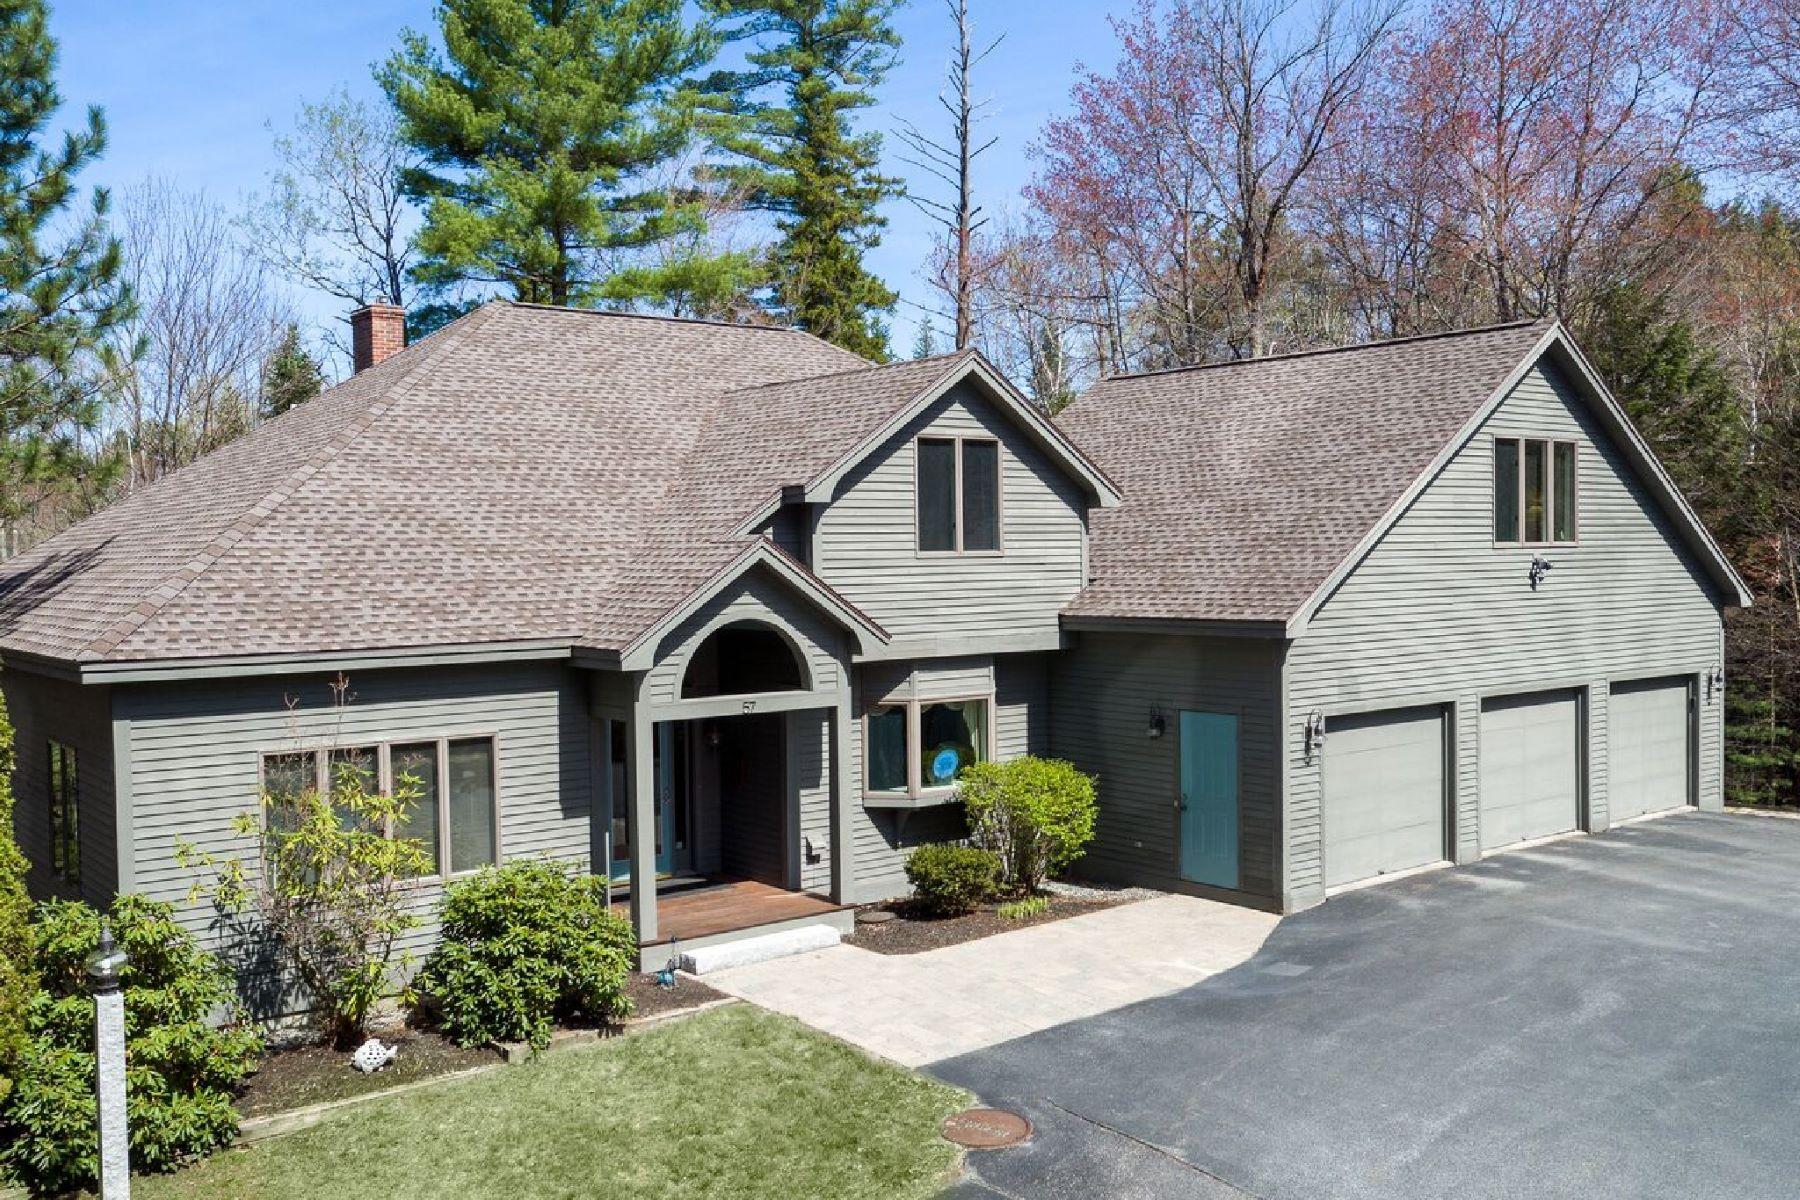 独户住宅 为 销售 在 Contemporay on Eastham golf course 57 Greensward 格兰瑟姆, 新罕布什尔州, 03753 美国